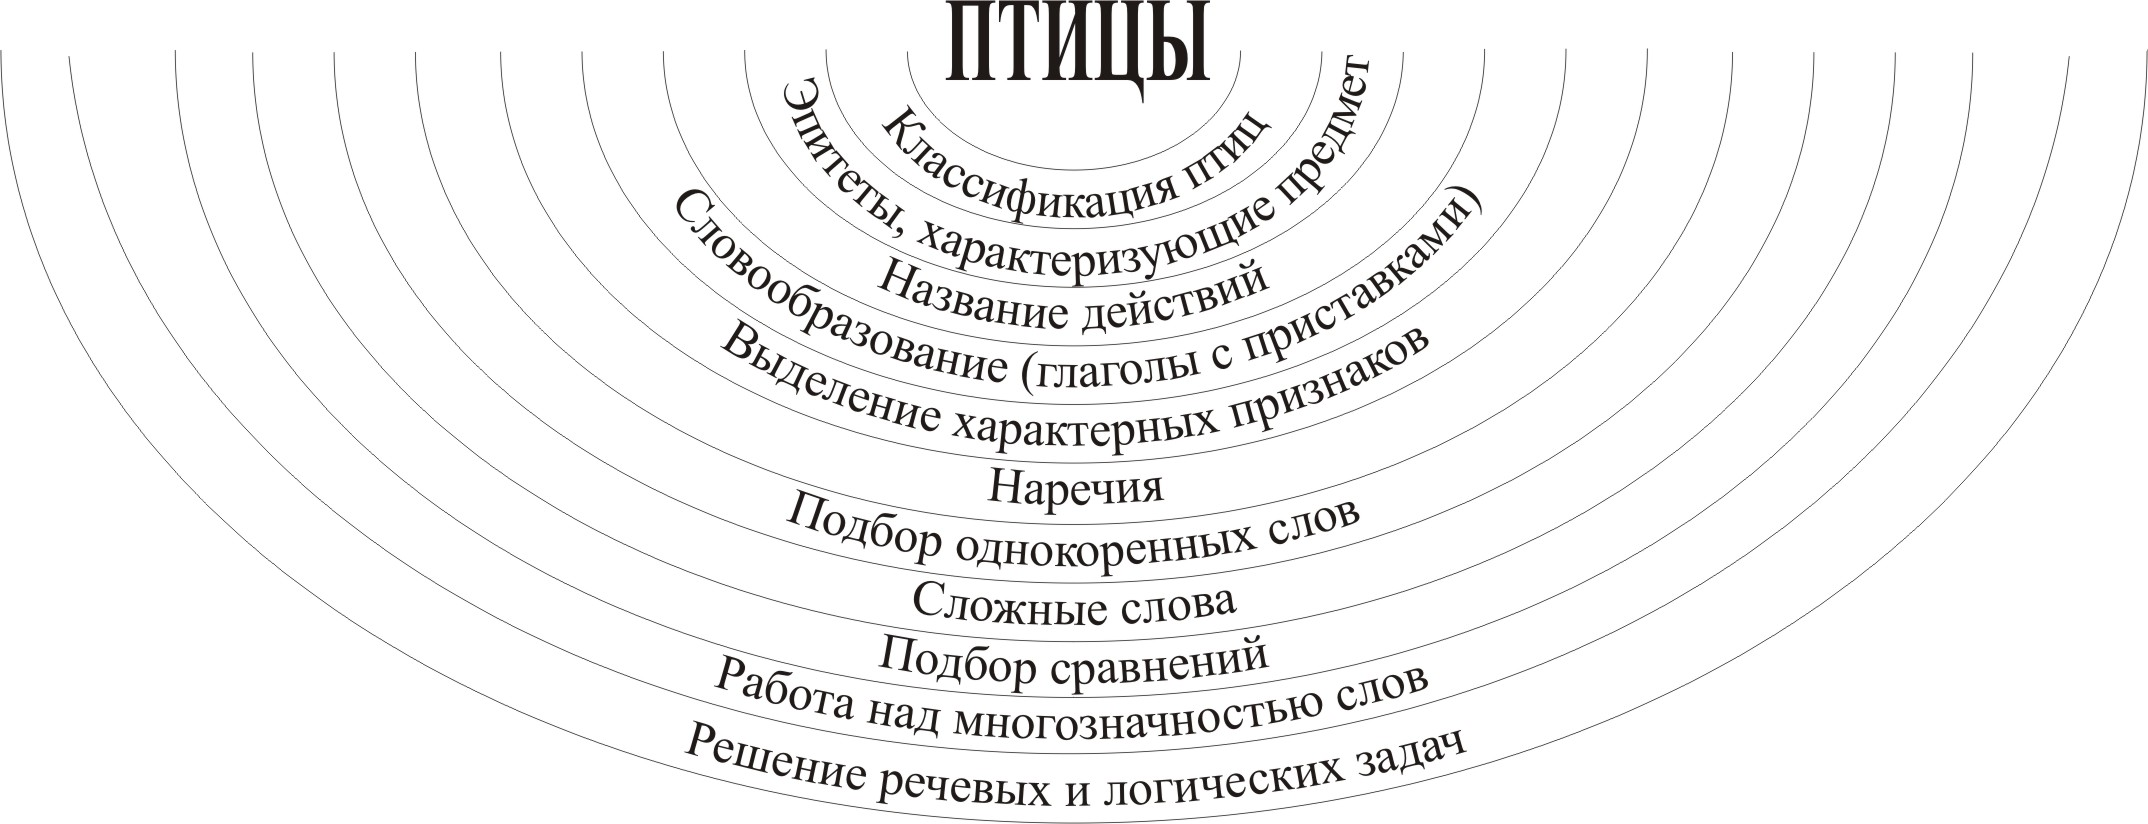 hello_html_m31b02c.jpg